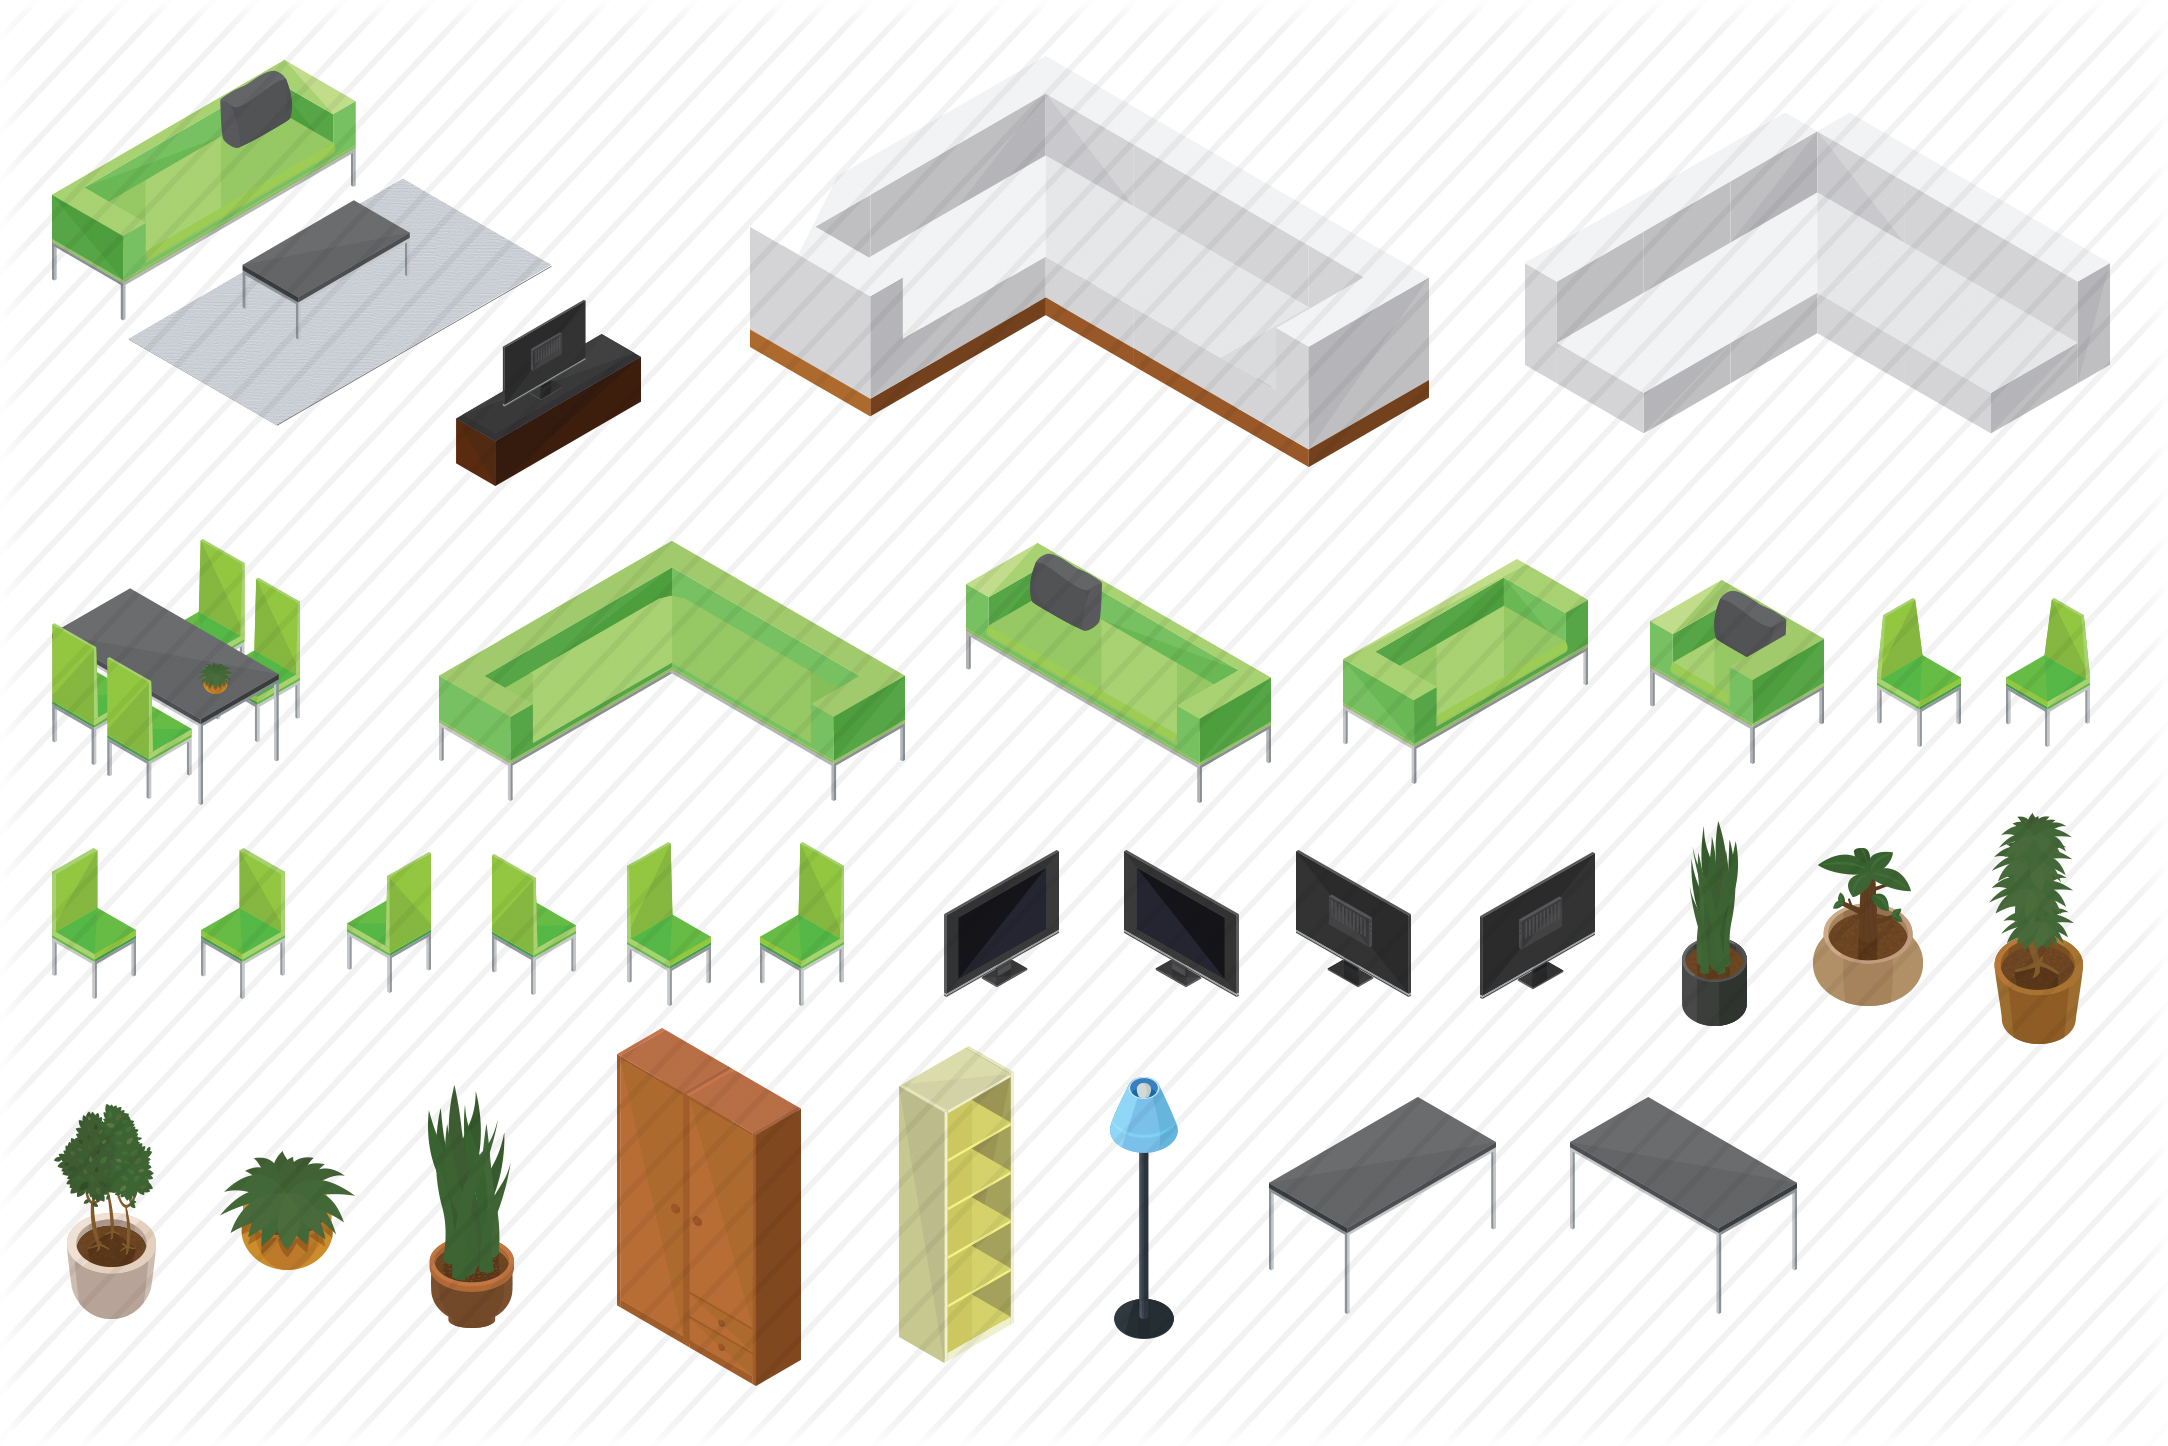 Livingroom-Isometric-Home-preview